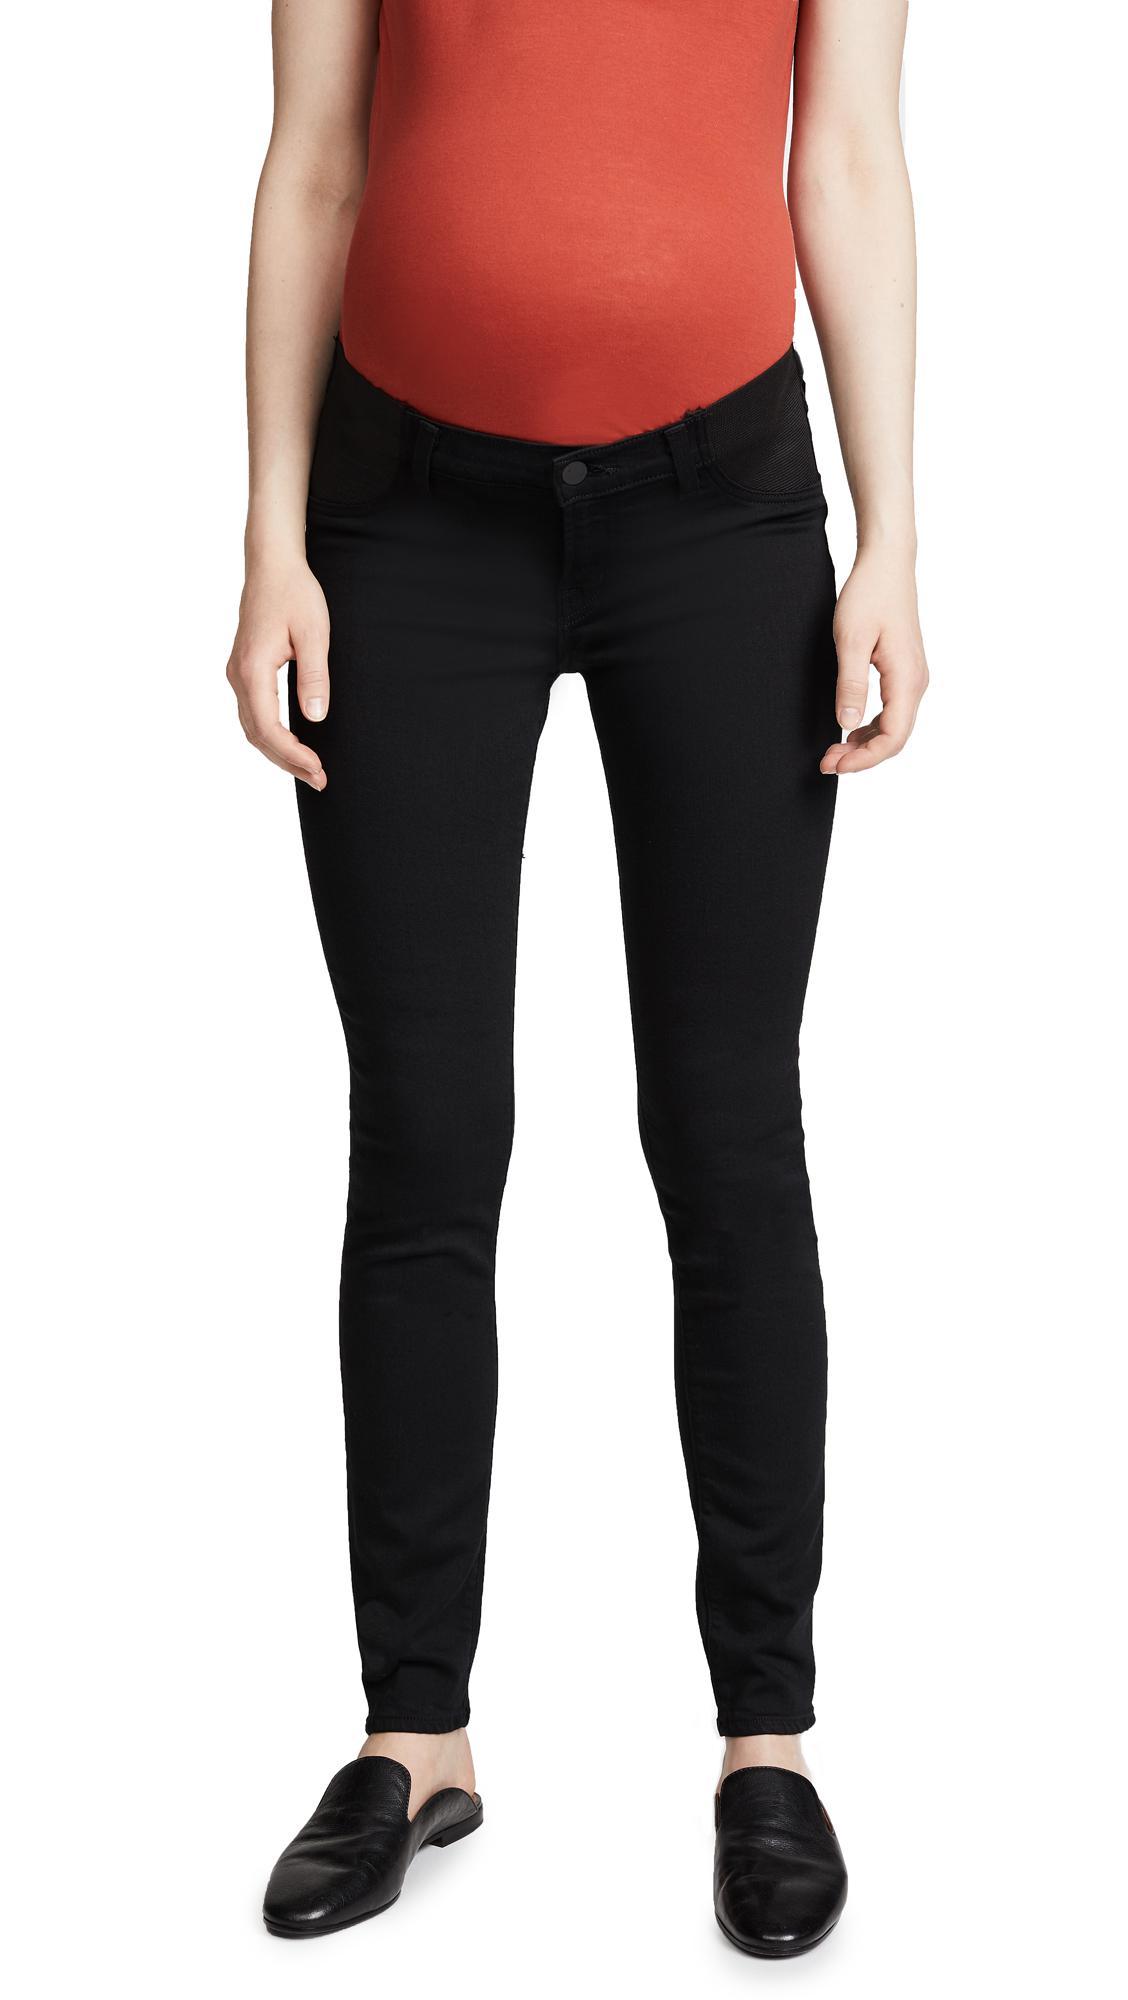 NWT J Brand Mama J Maternity Mid-Rise Skinny Pants In Blanc White $228